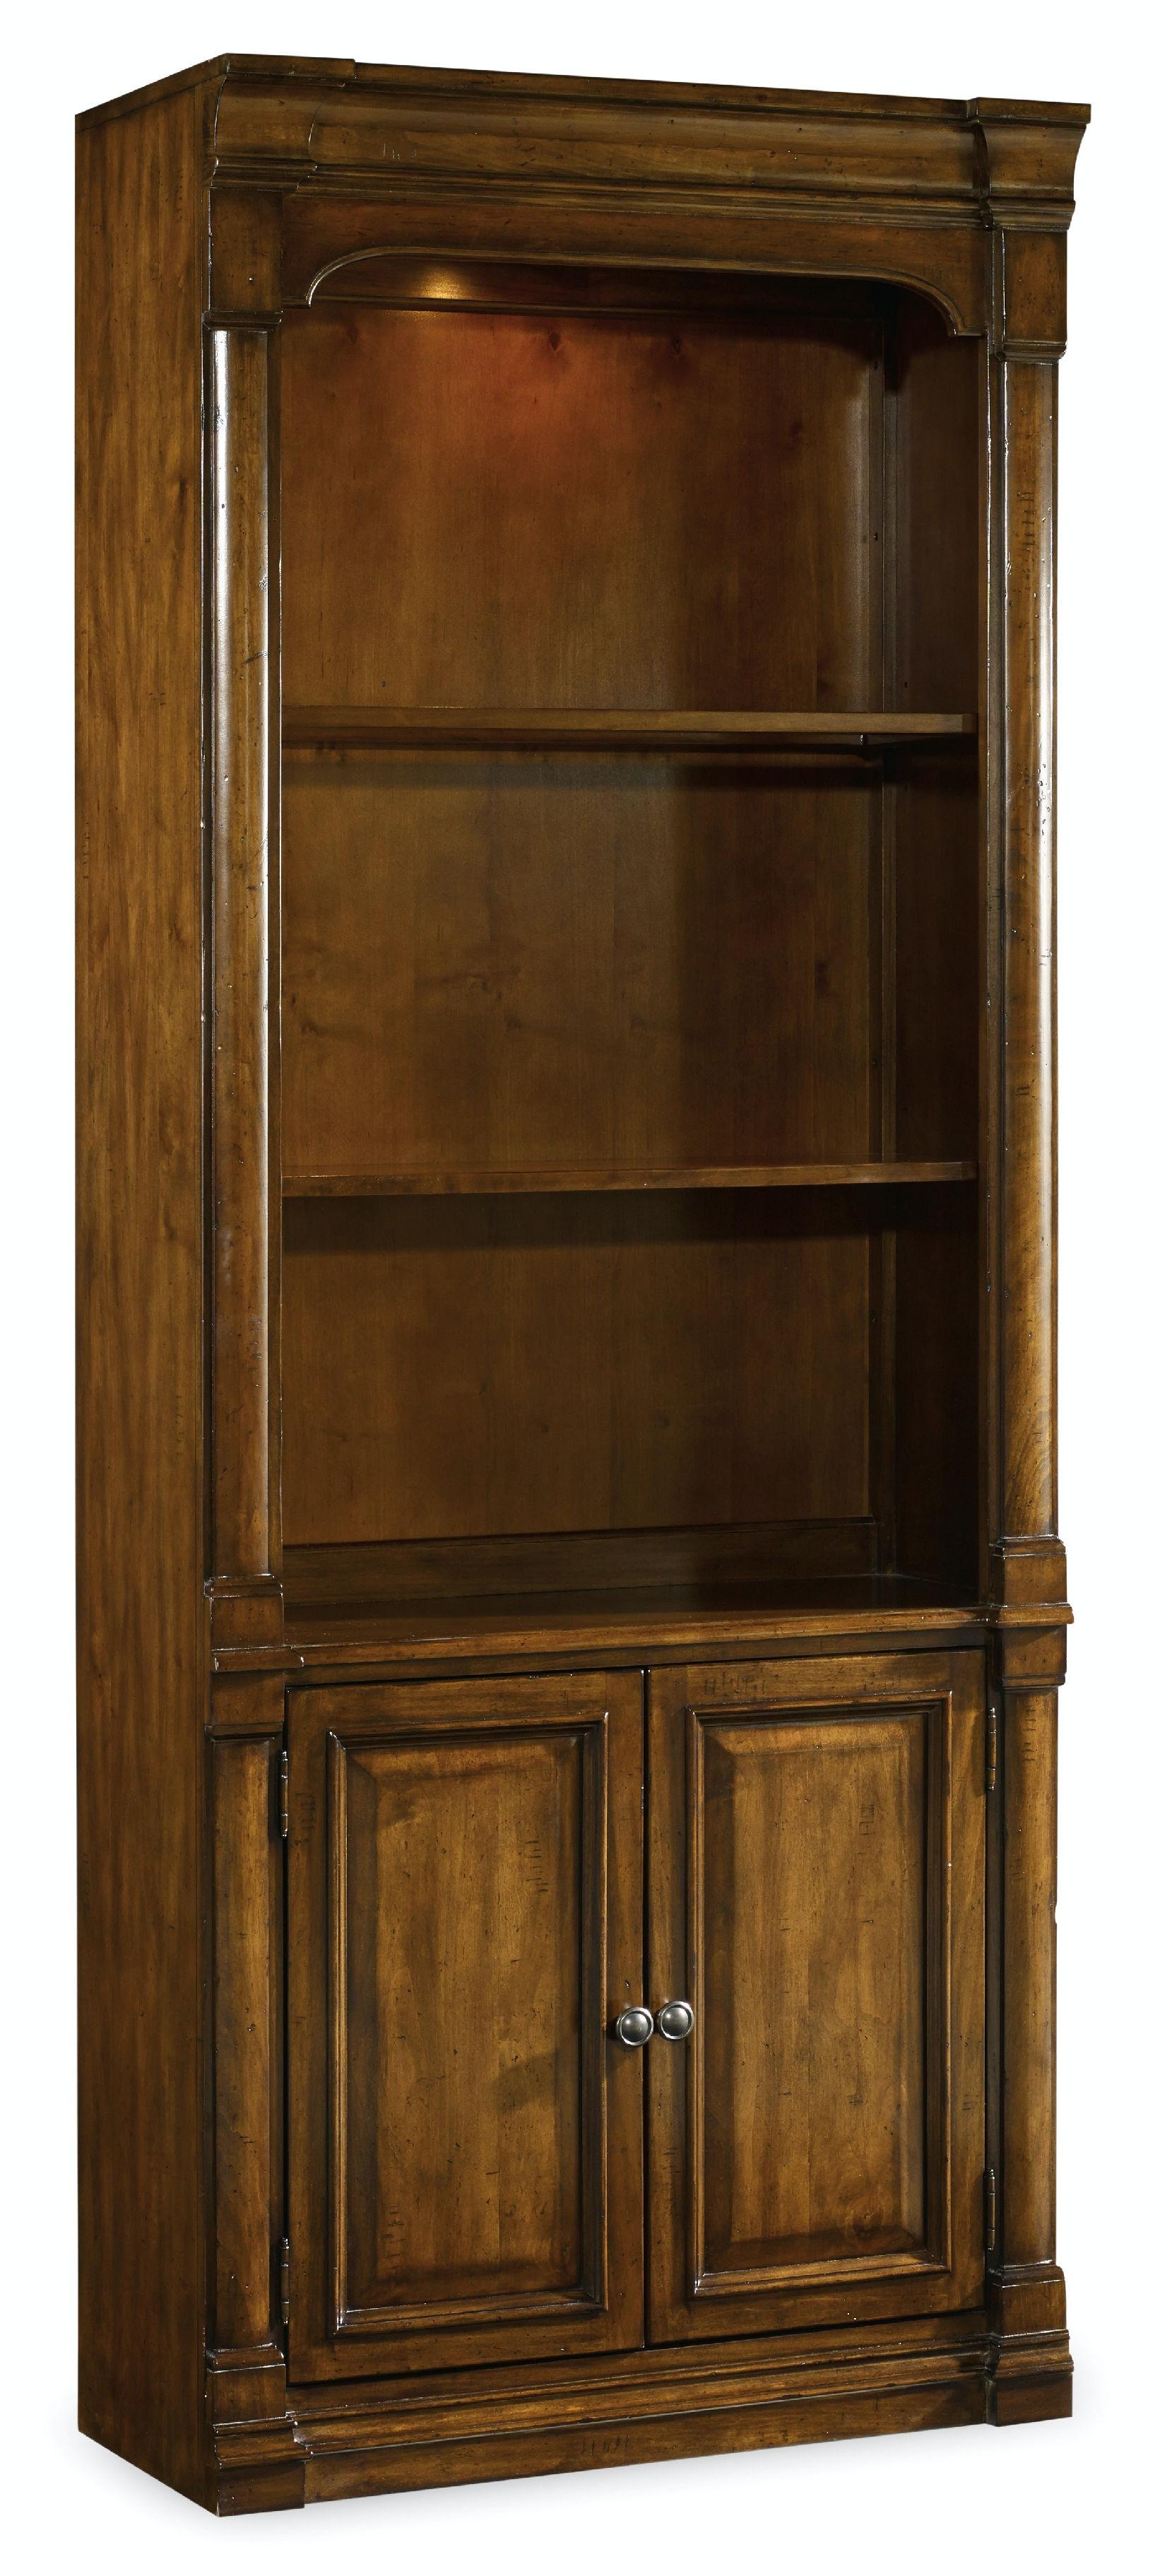 Marvelous Tynecastle Bunching Bookcase